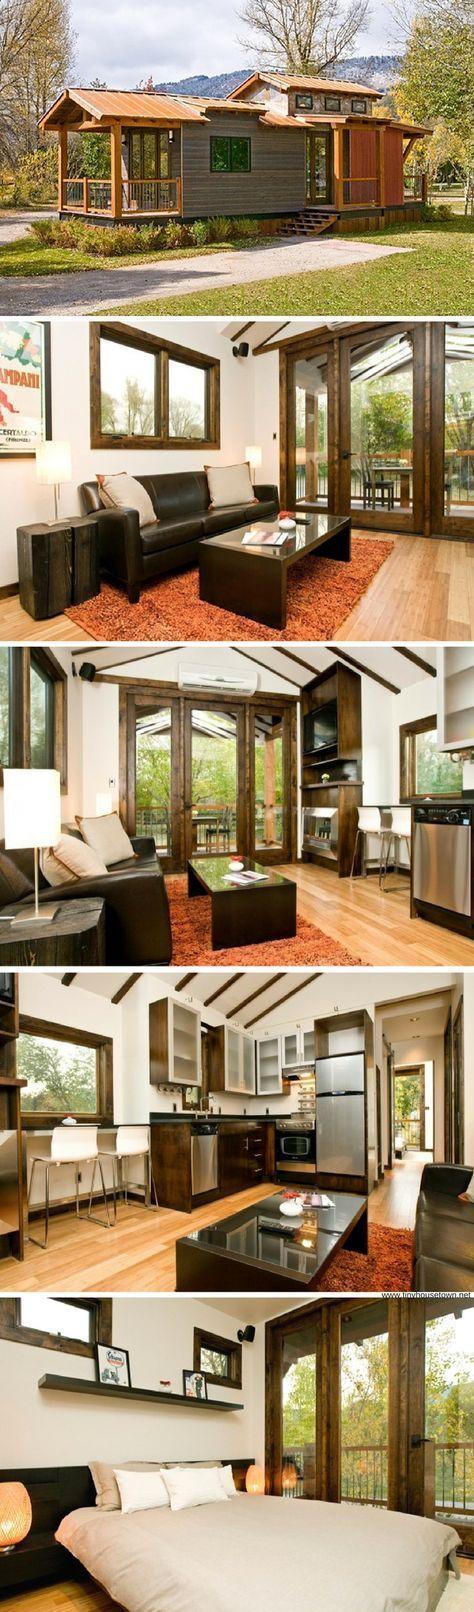 The Caboose: a 400 sq ft park model home #fachadasminimalistas